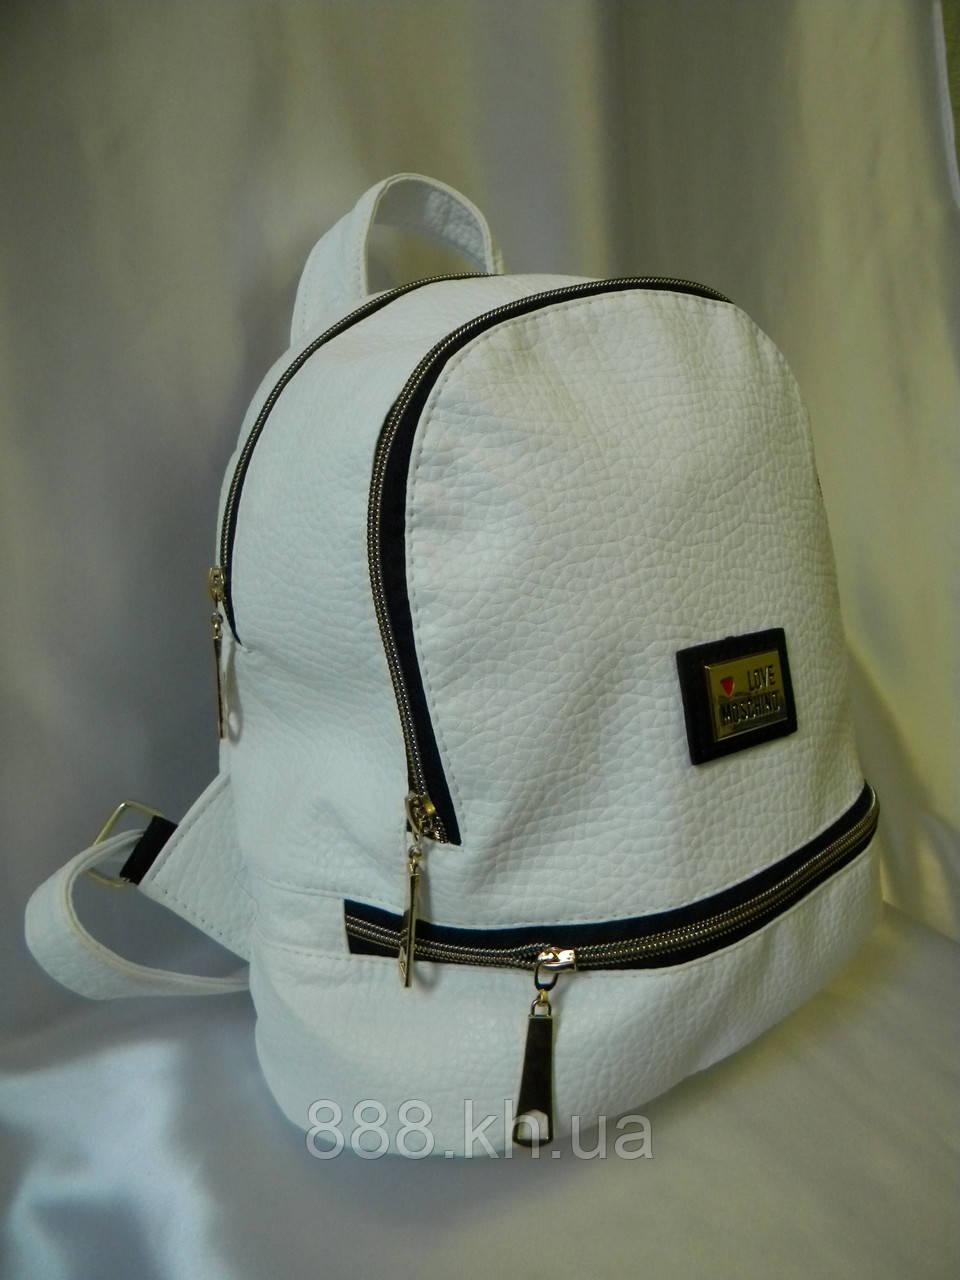 Женский рюкзак MOSCHINO рюкзак женский кожзам белый не оригинал